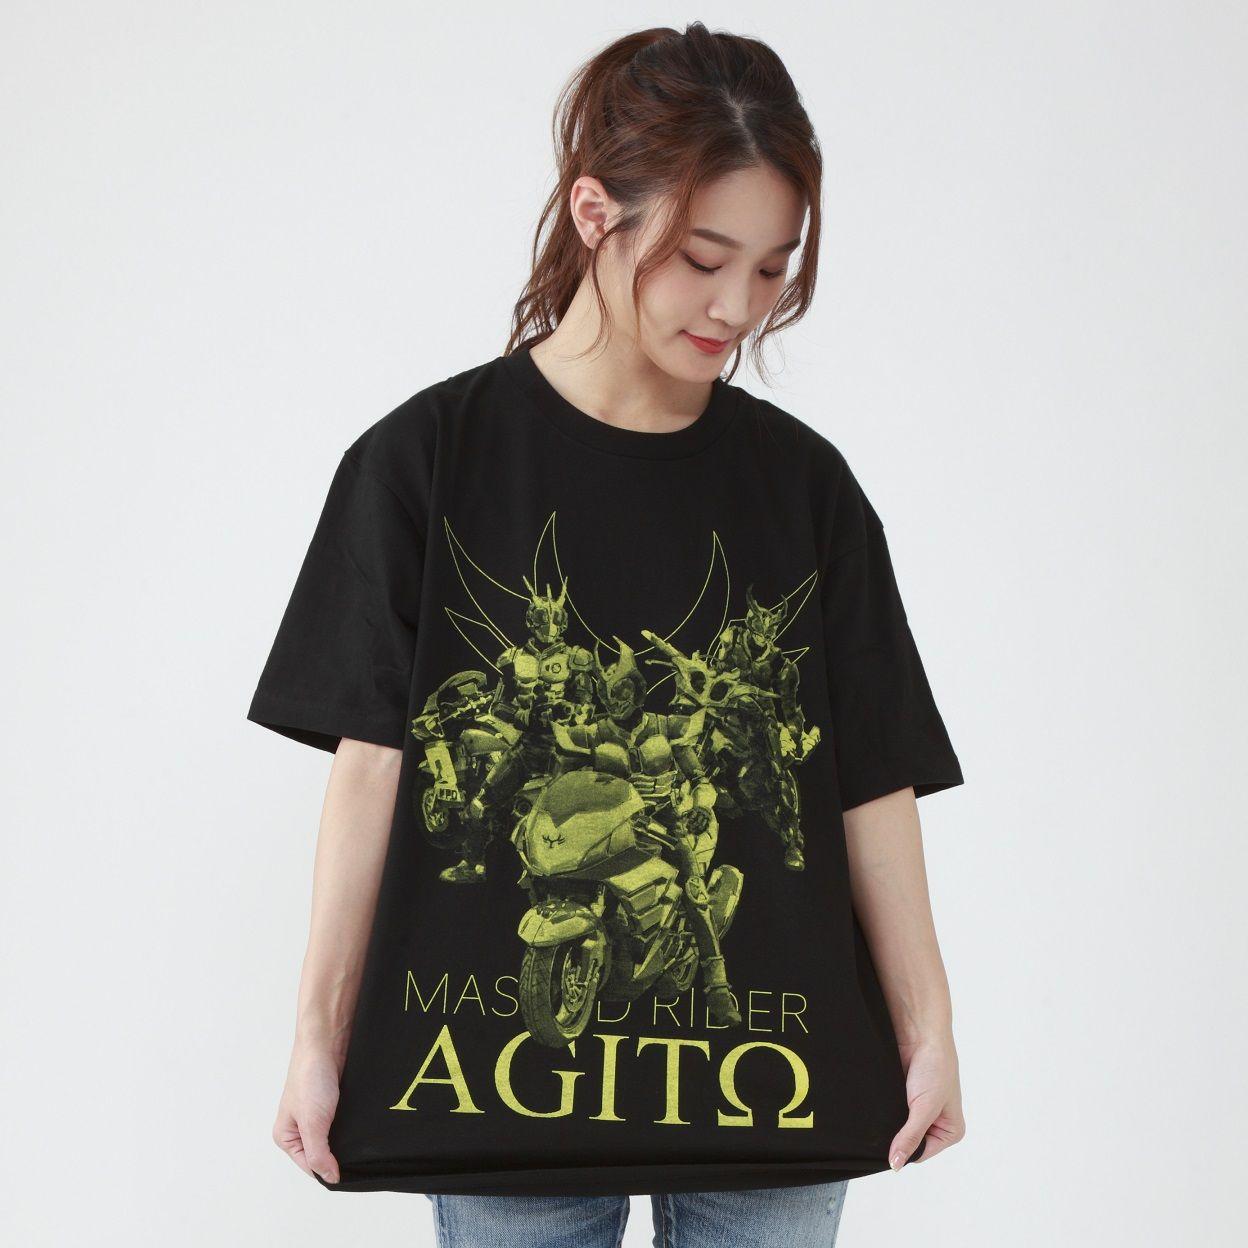 Yoshihito Sugahara Project Kamen Rider Agito T-Shirt